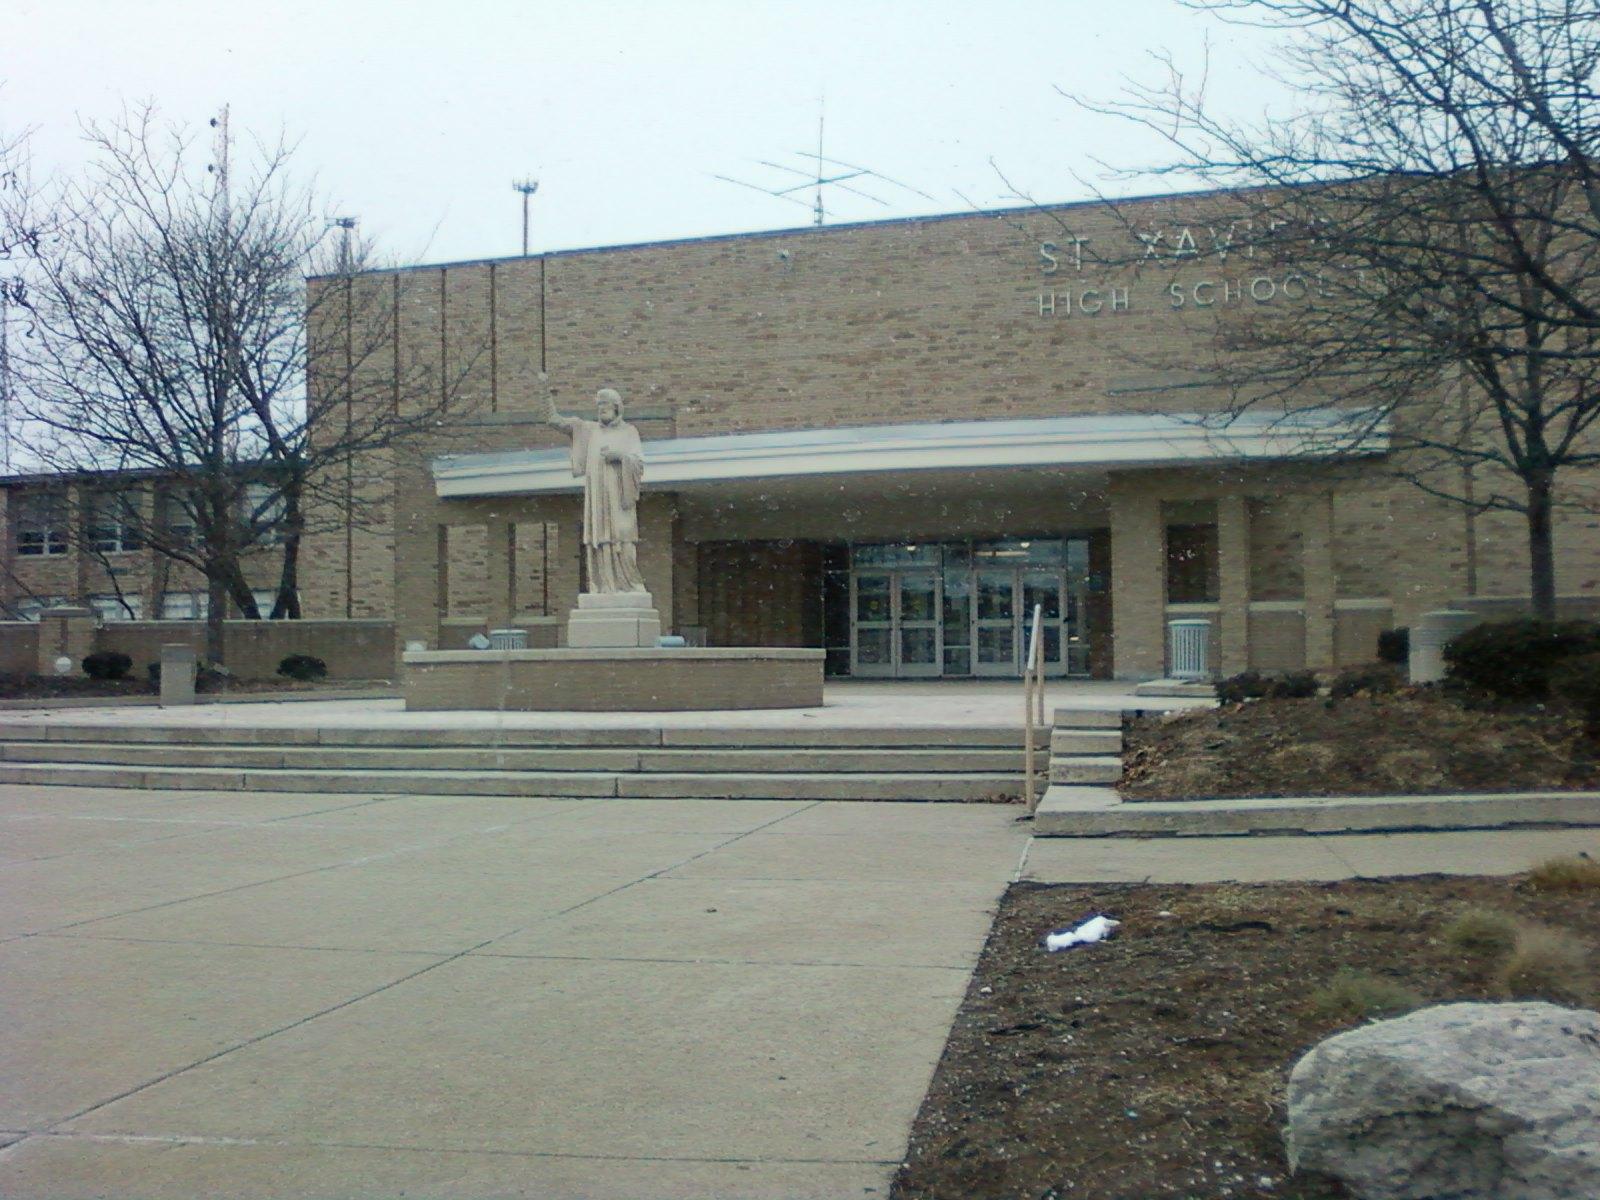 Description st xavier high school cincinnati front entrance